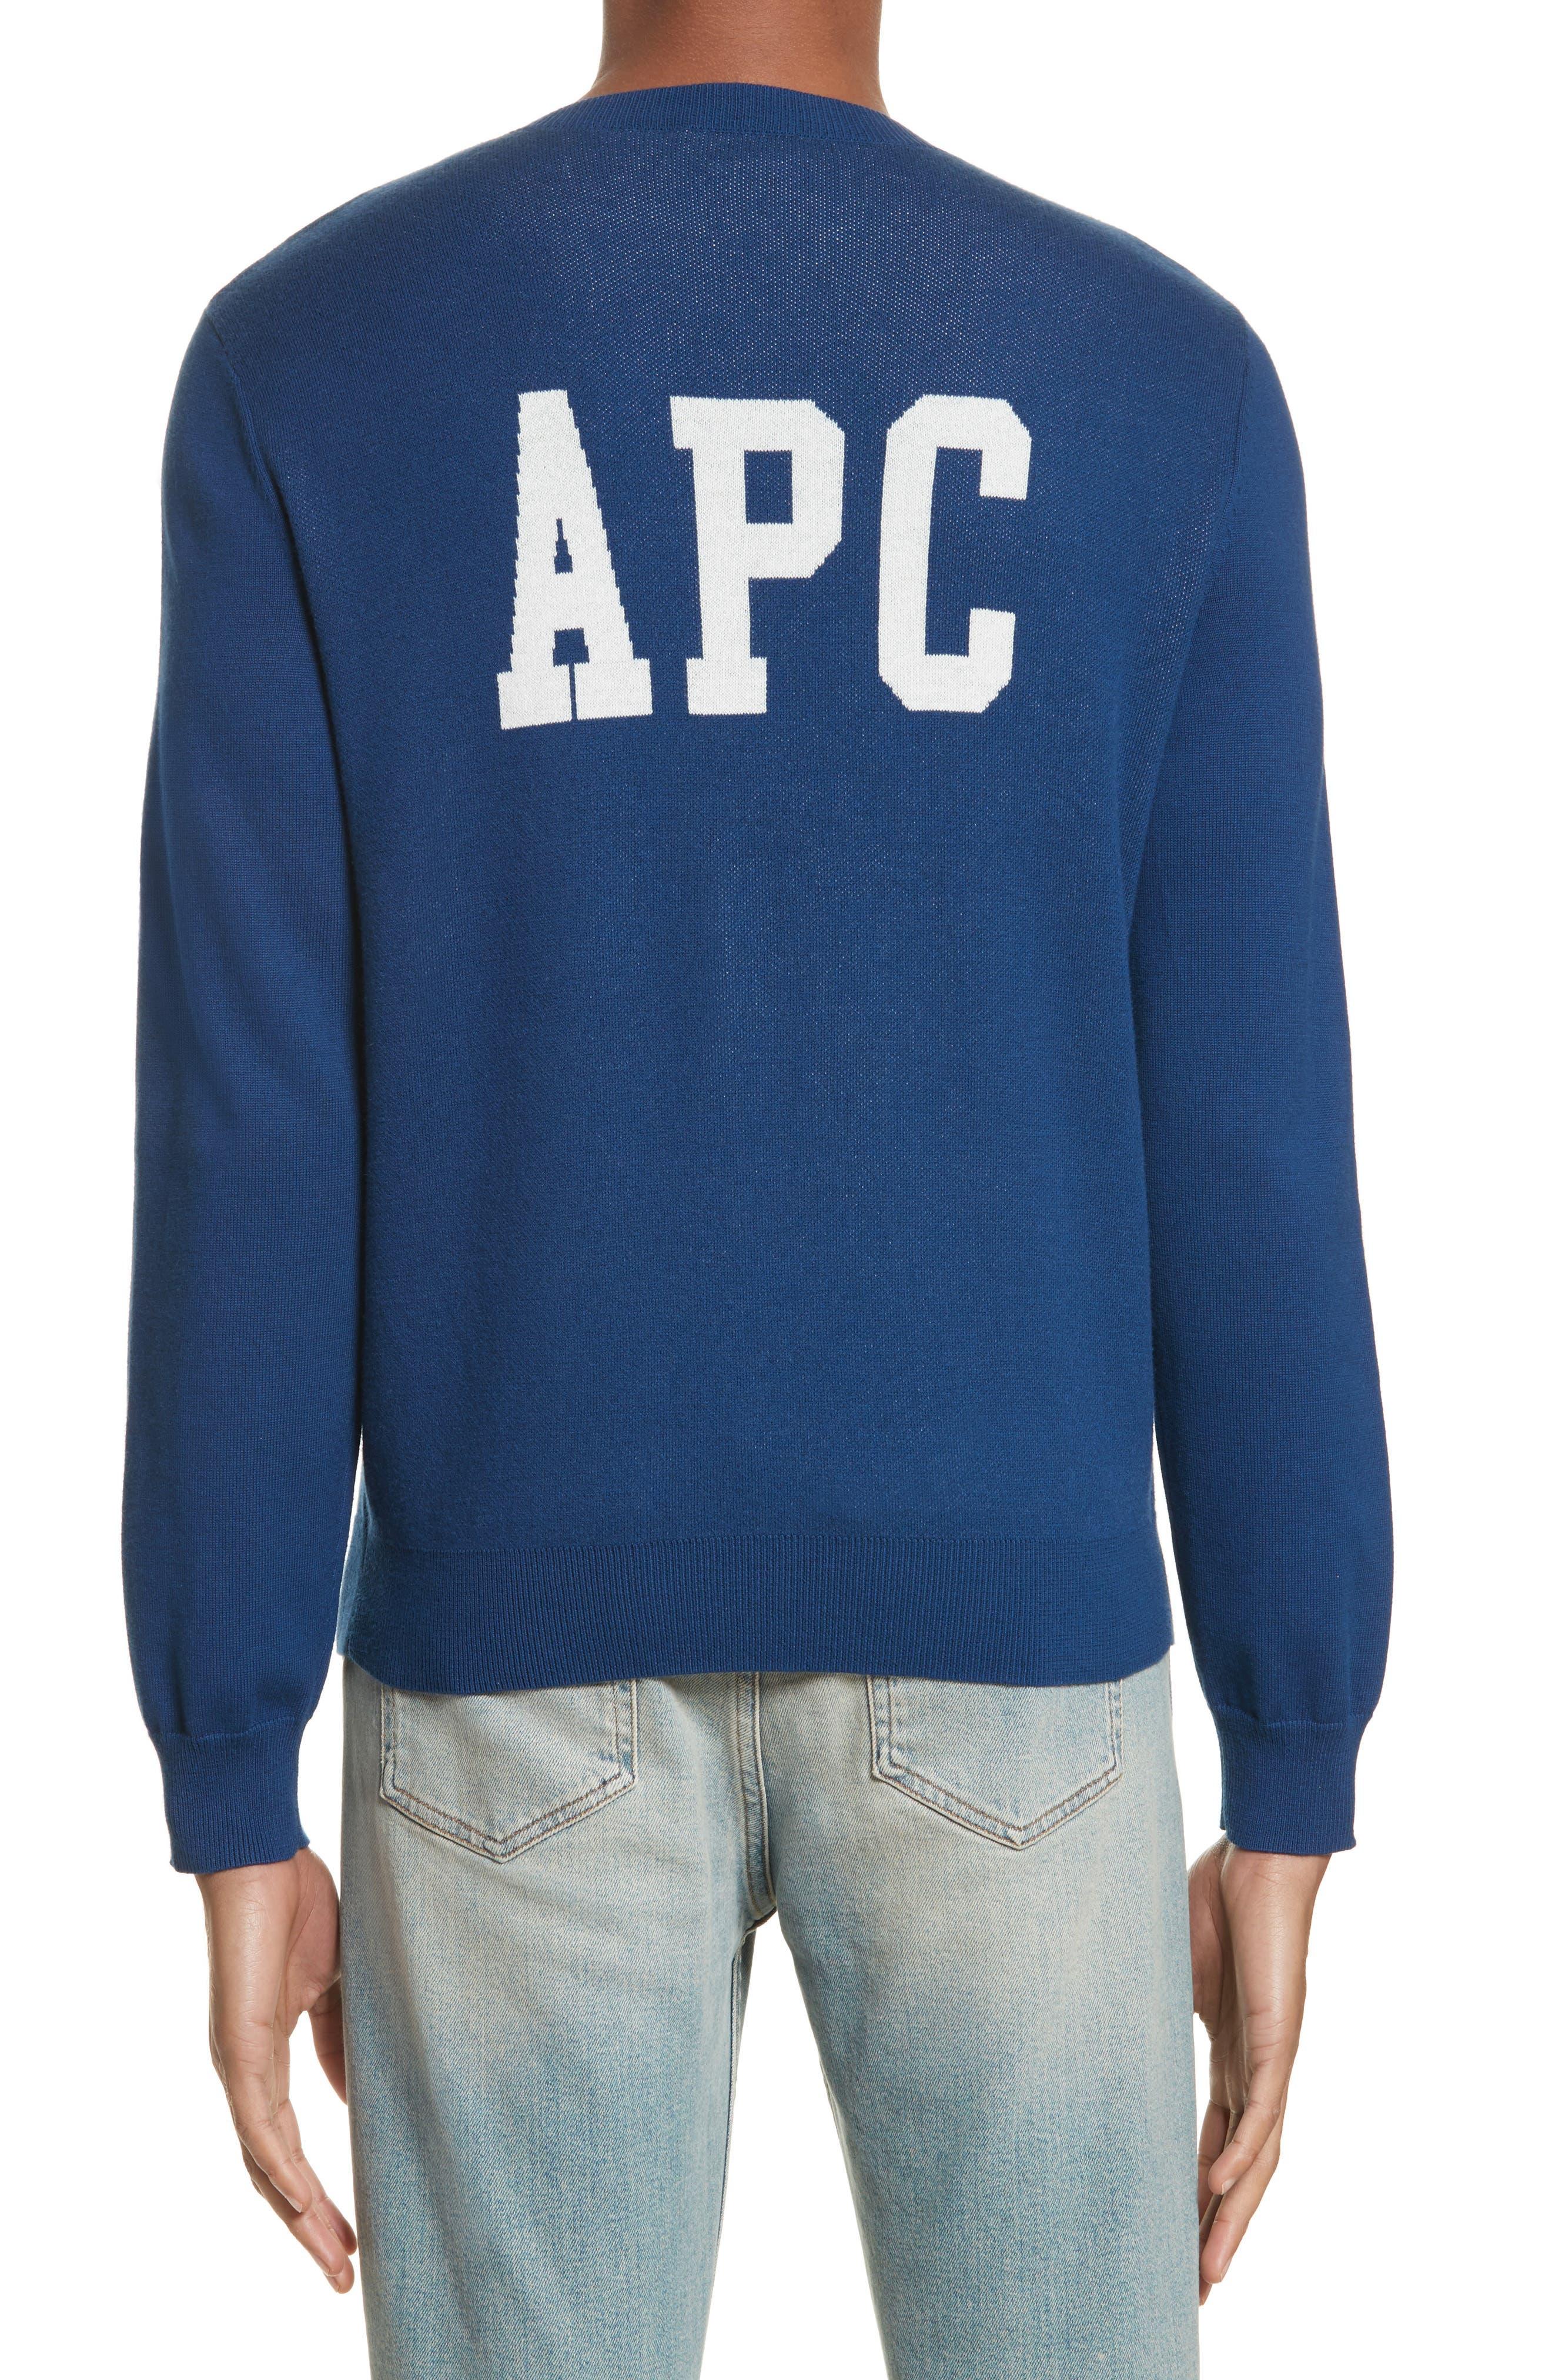 CIA Crewneck Sweater,                             Alternate thumbnail 2, color,                             Bleu Fonce Iah